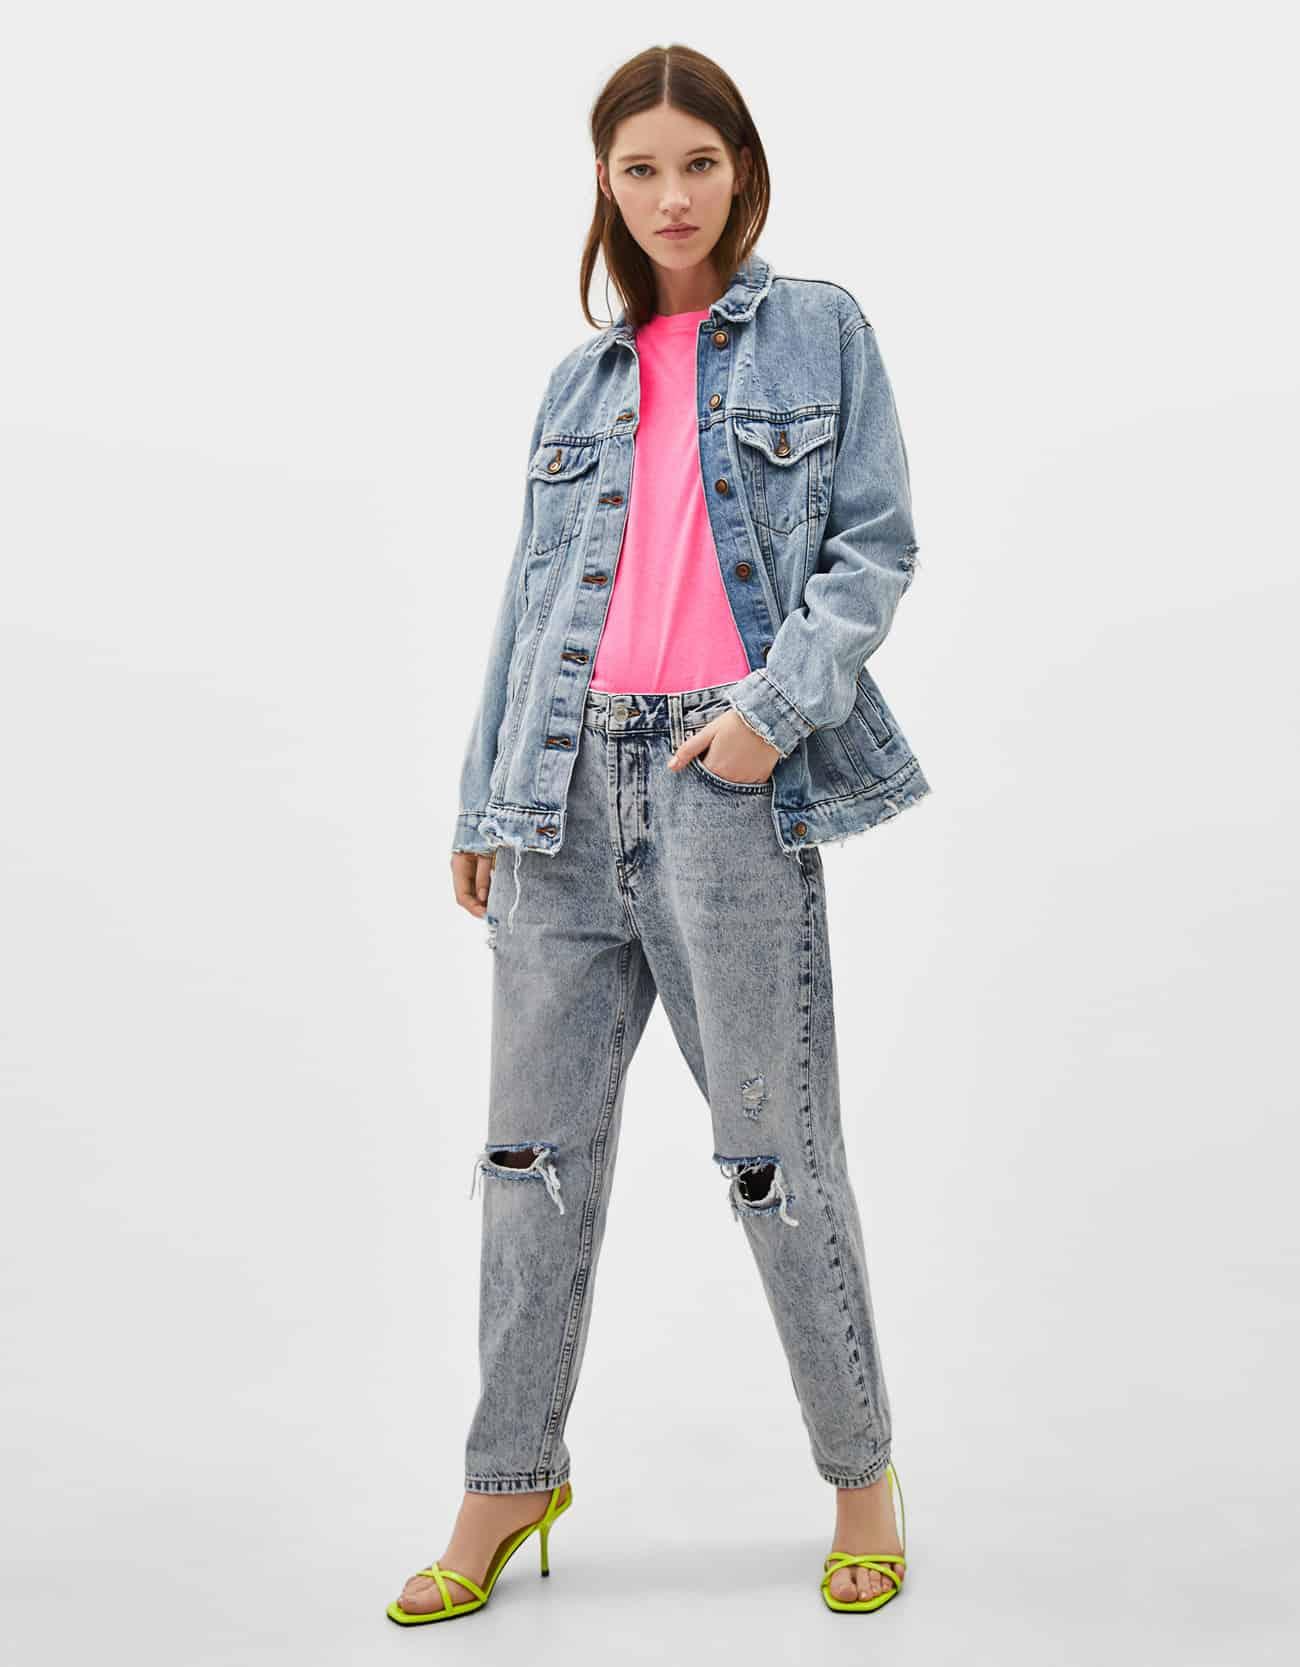 Giubbotto di jeans oversize Bershka a 35,99 euro